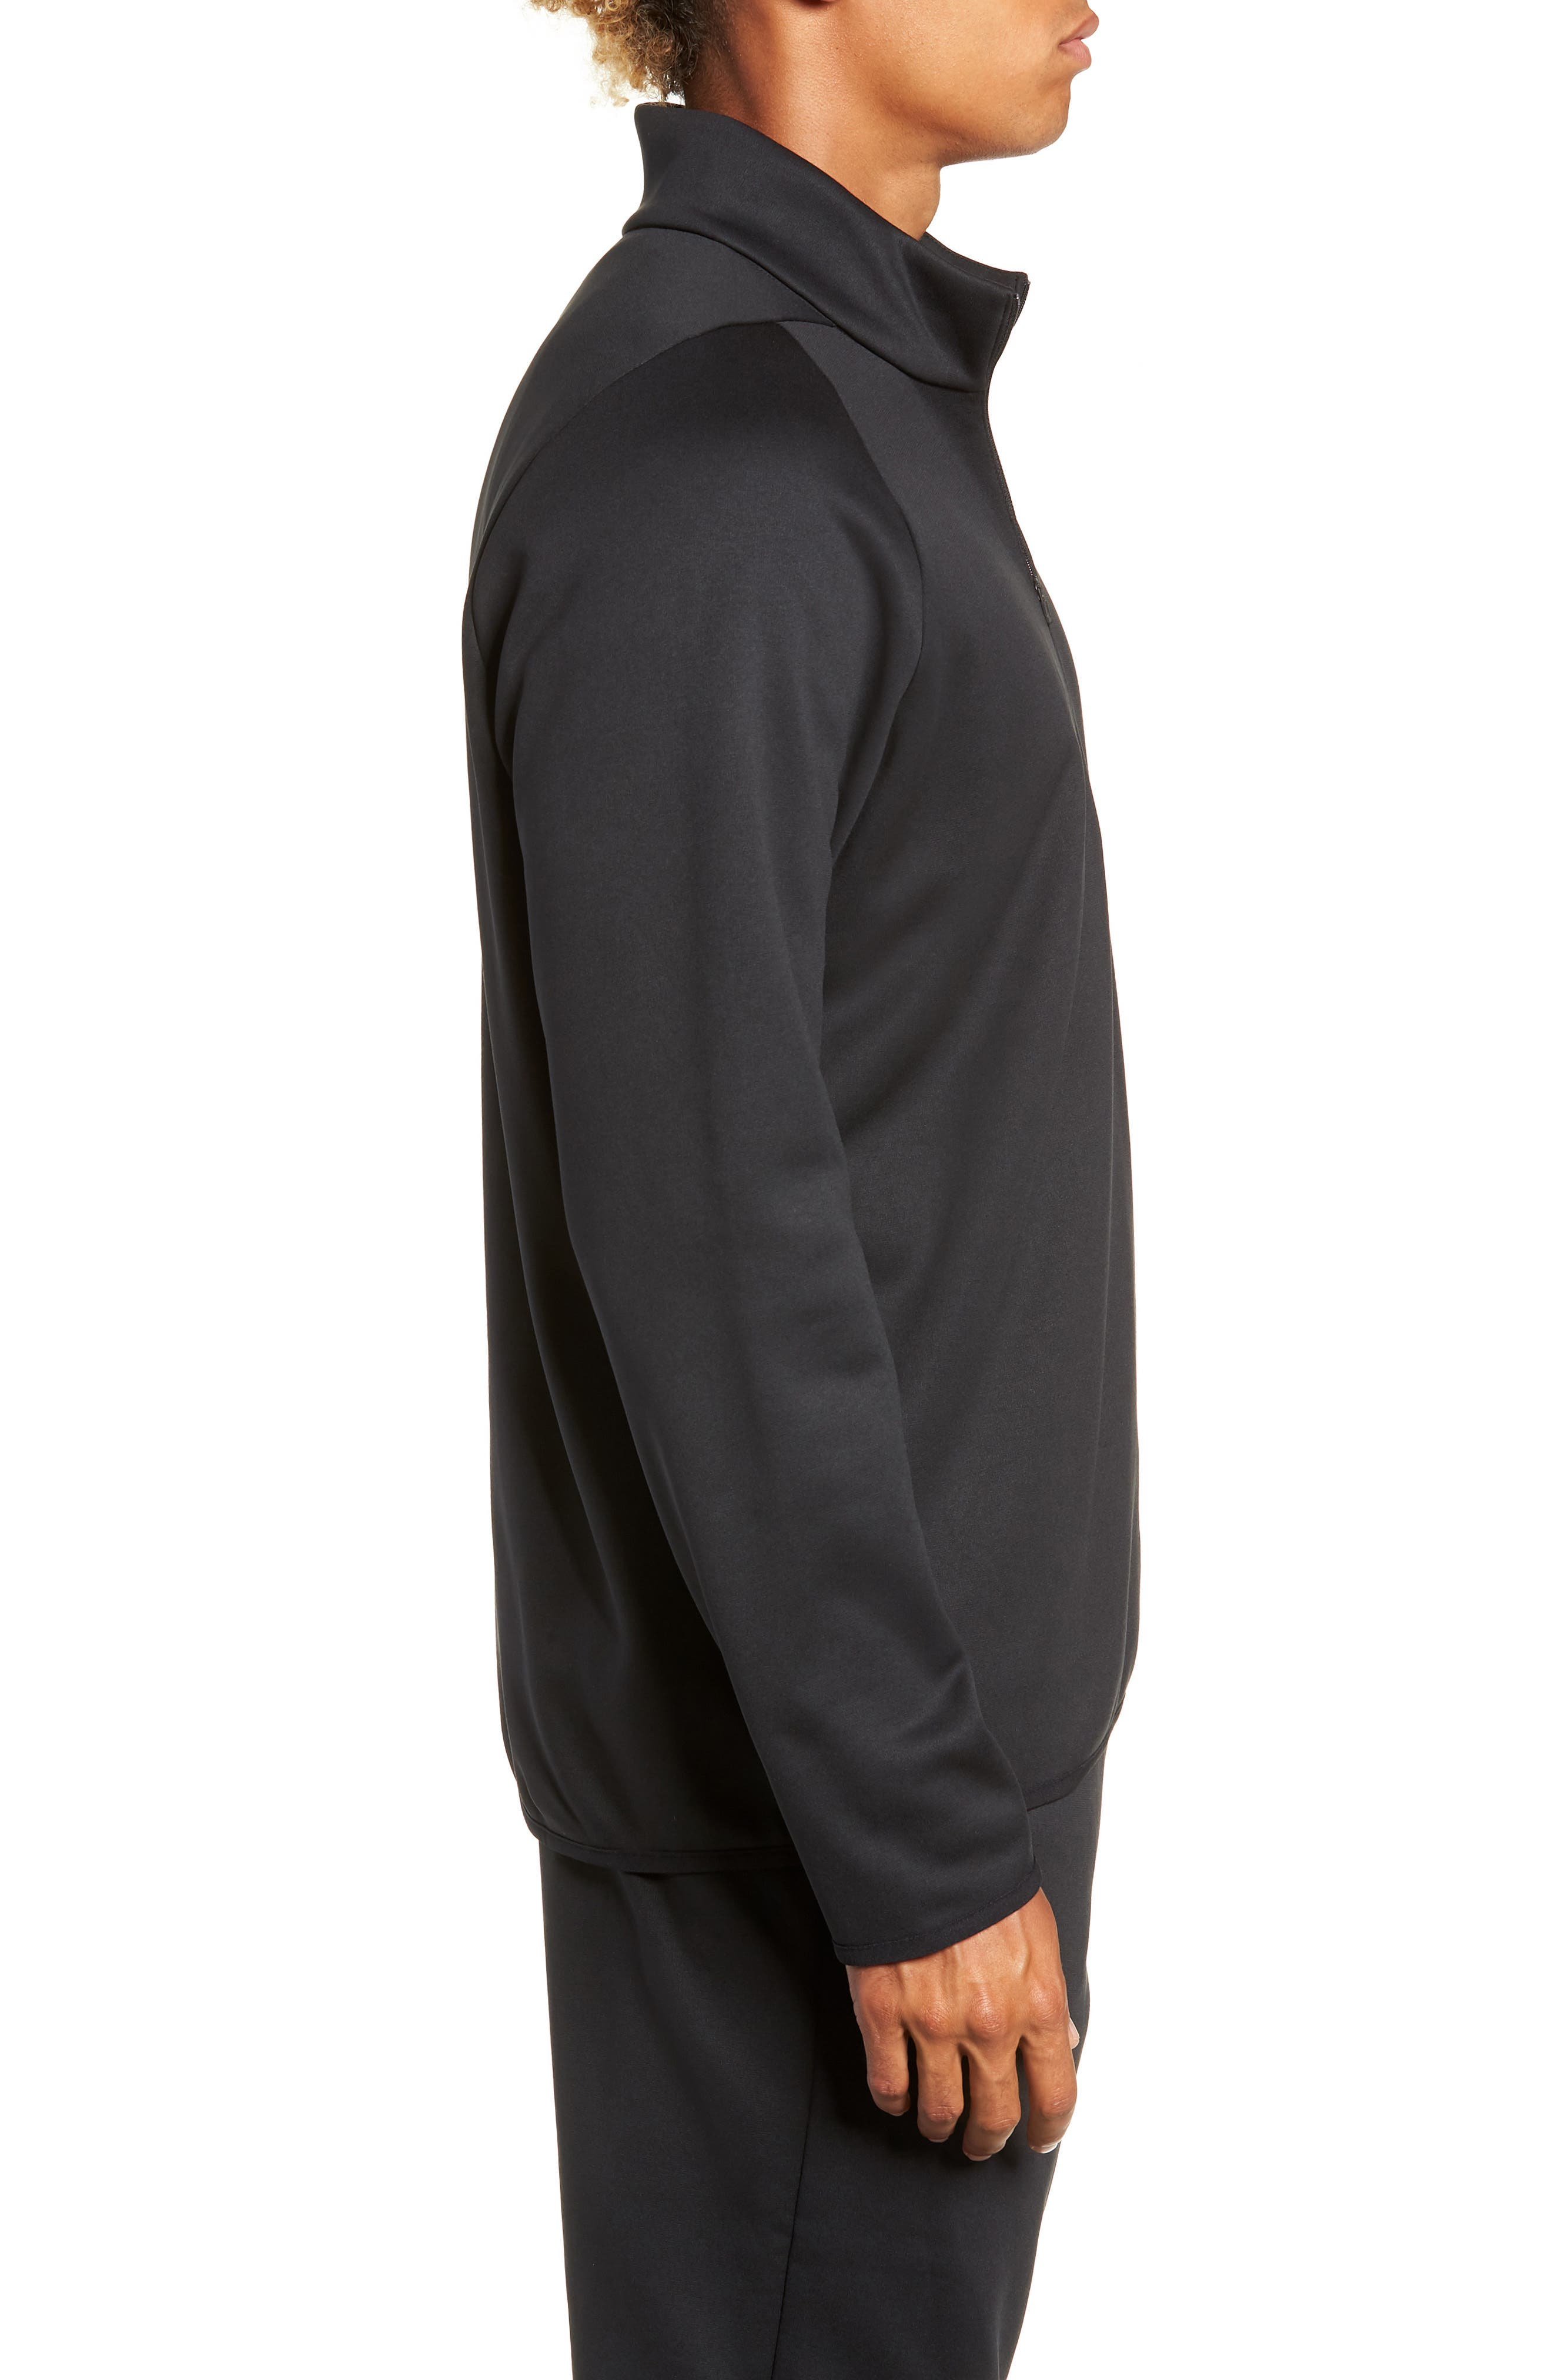 Quarter Zip Pullover,                             Alternate thumbnail 3, color,                             BLACK/ DARK GREY